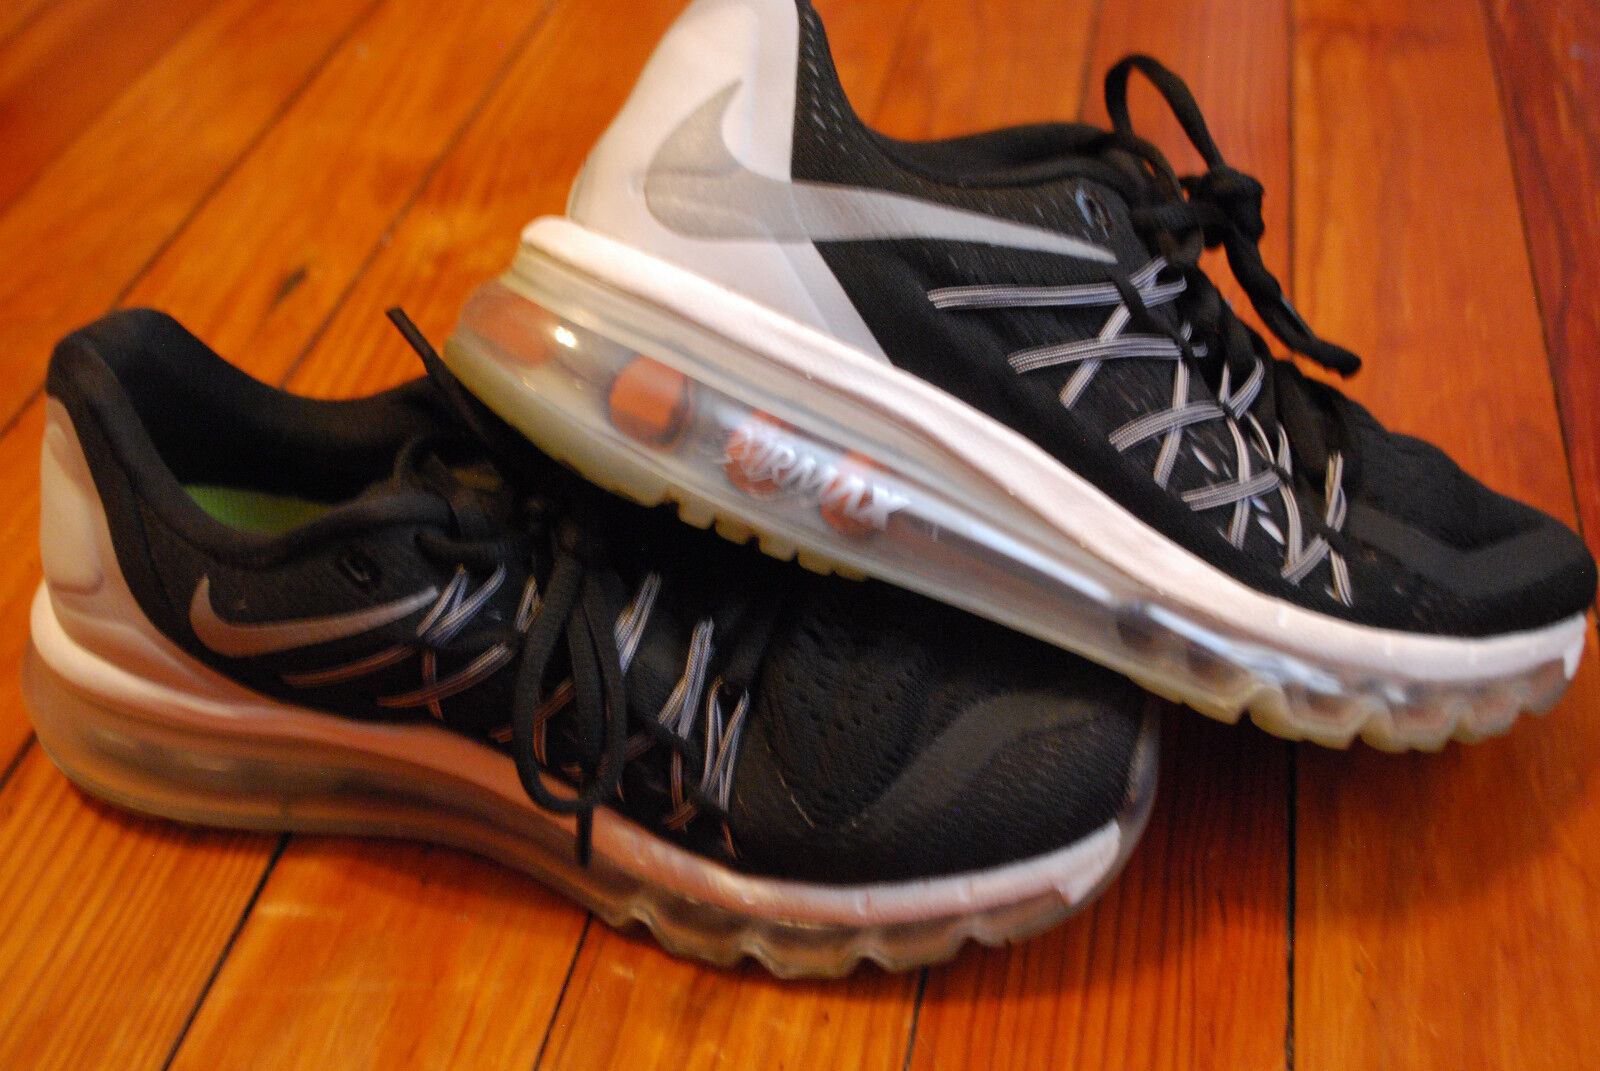 Le nike air max 2015 in nero bianco d'argento in 2015 scarpe da ginnastica (7) 698903-001 dc9a50